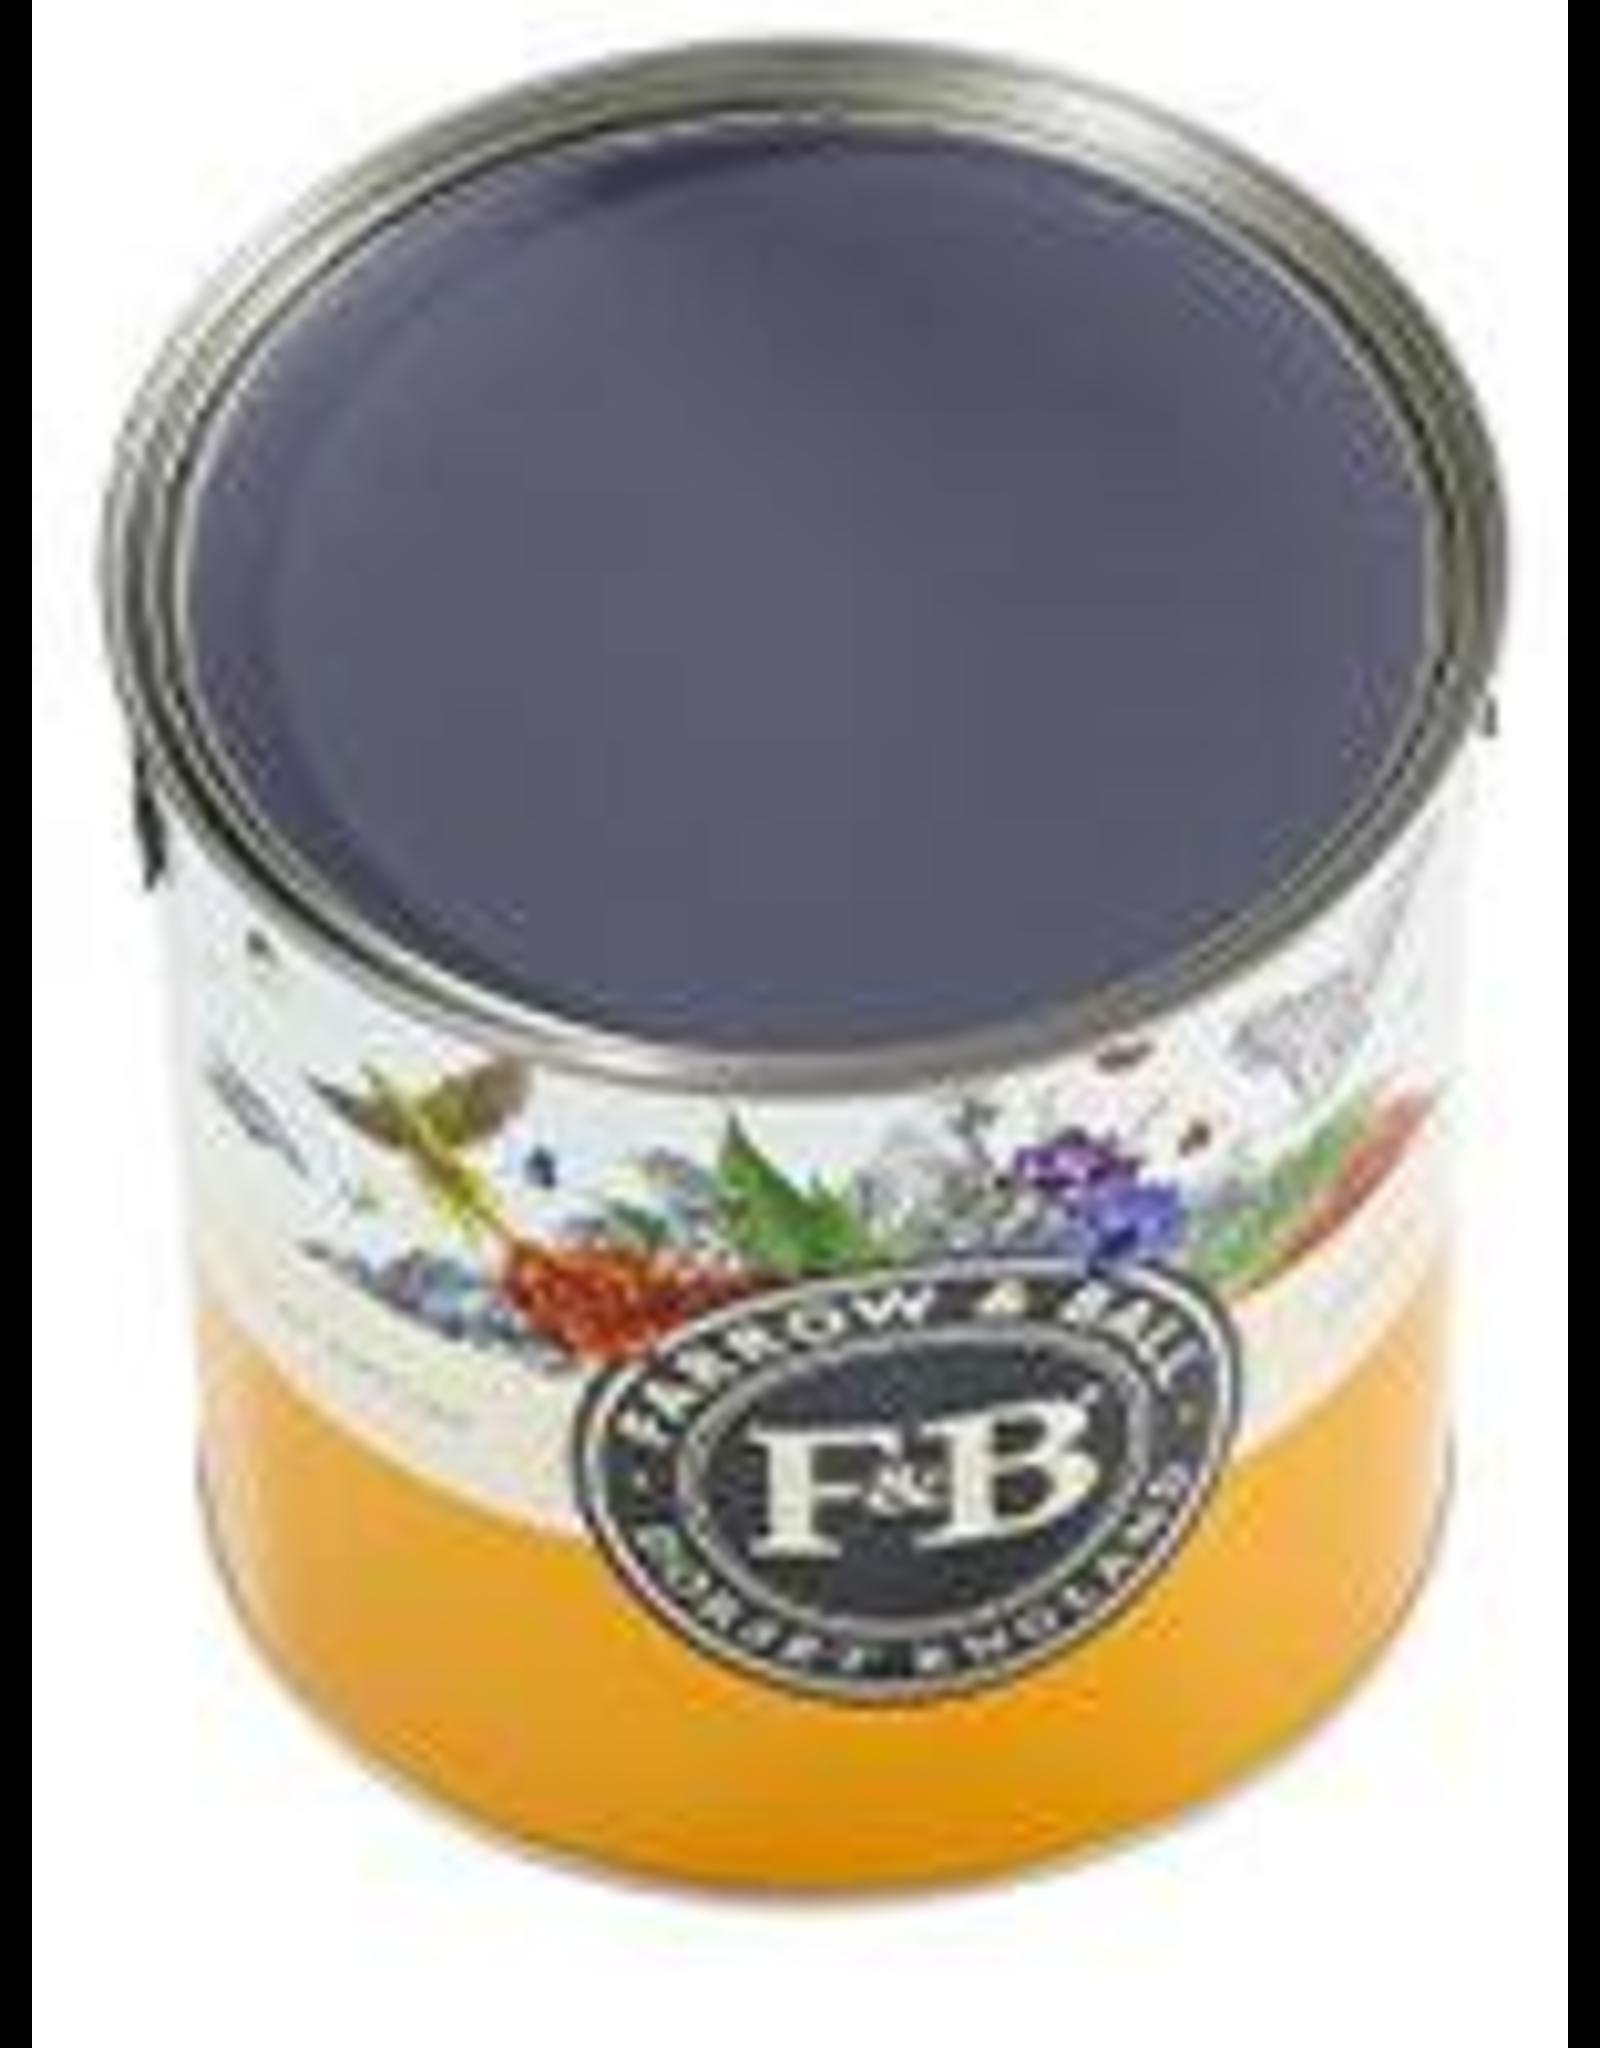 Farrow and Ball US Gallon Modern Emulsion NHM Imperial Purple No.W40